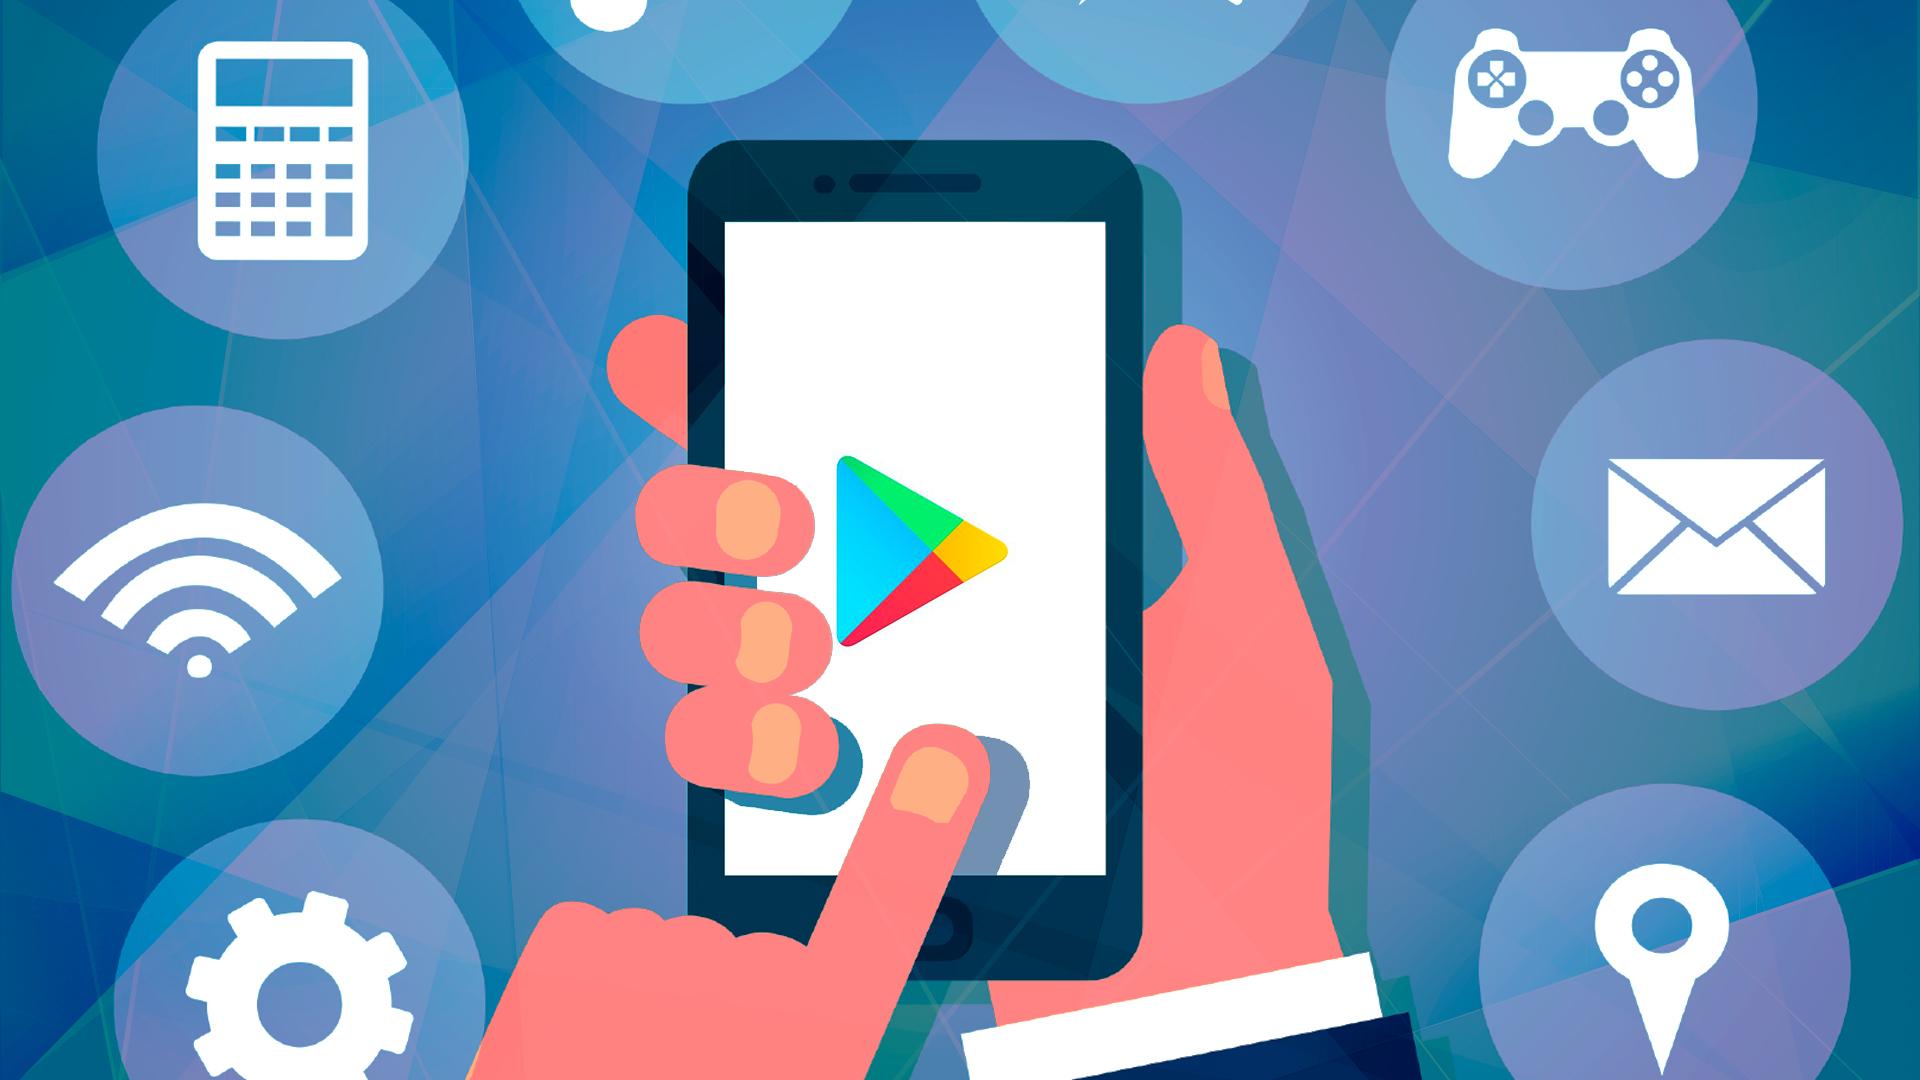 Logo, App Store, Play Store, Google Play Store, Google Play, Google PLay Services, Play Store Werbung